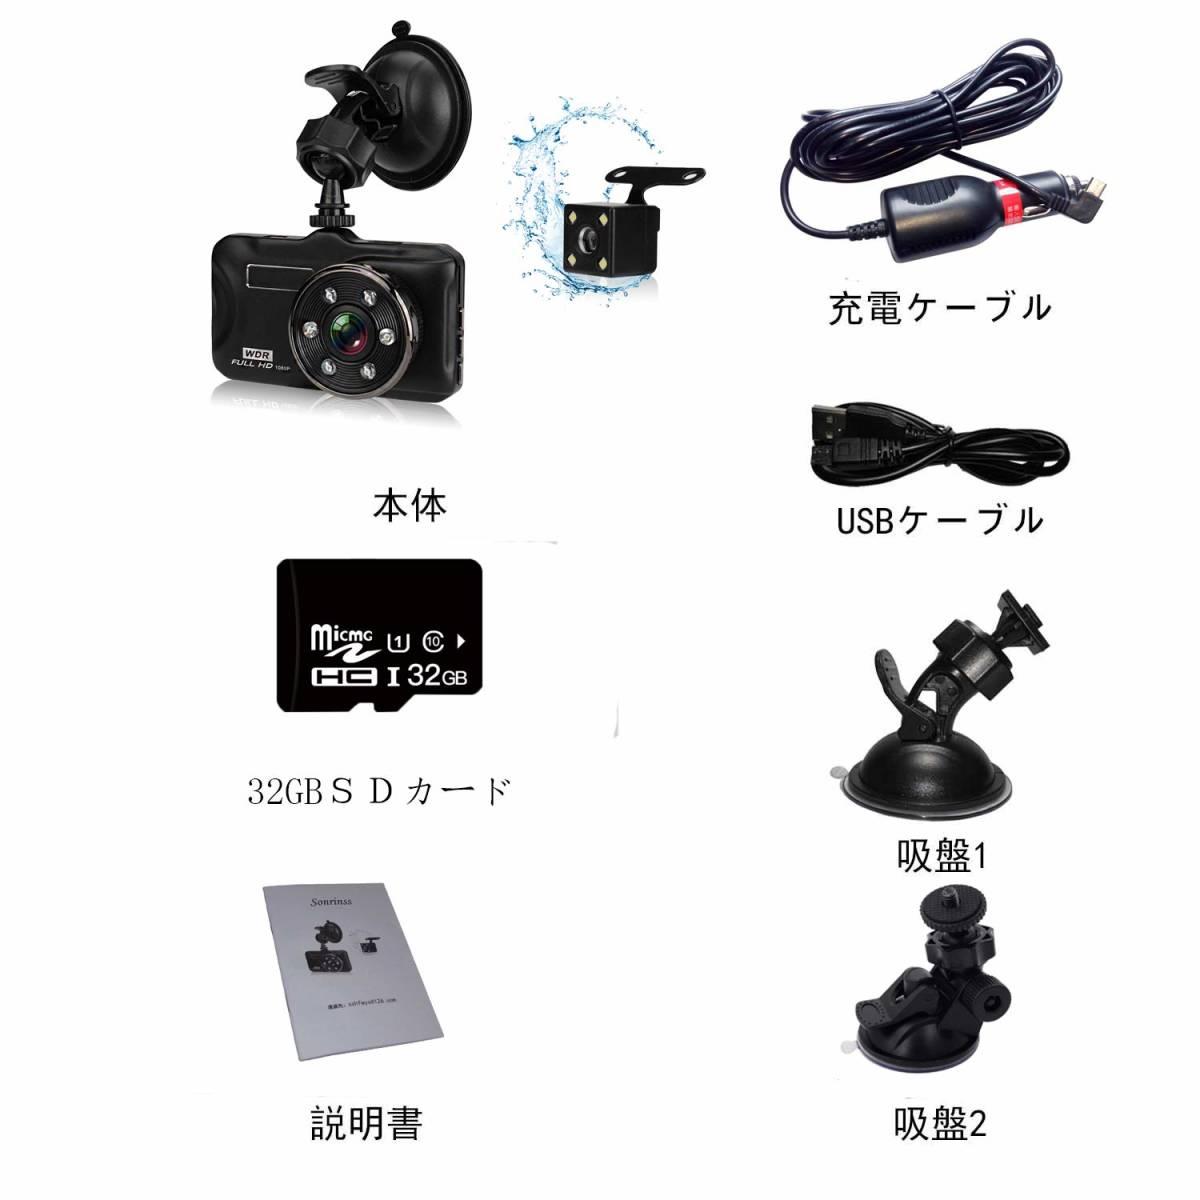 O951 新品 ドライブレコーダー 前後カメラ 32GB SDカード付き 1080P フルHD 1800万画素 3インチ 夜間撮影 170°広視野角 常時録画_画像2